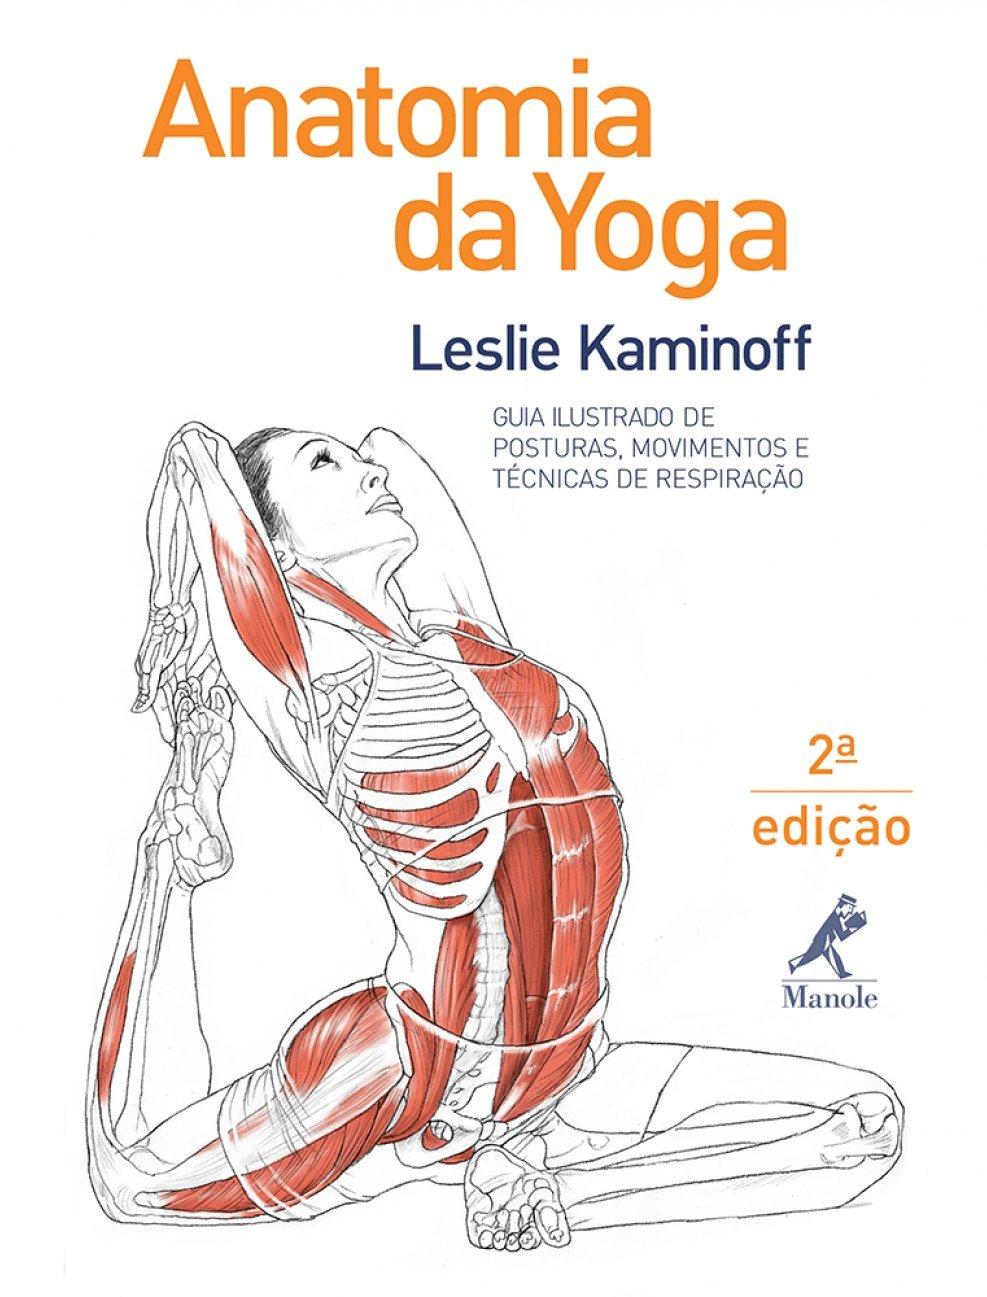 Anatomia da Yoga: Amazon.es: Leslie Kaminoff: Libros